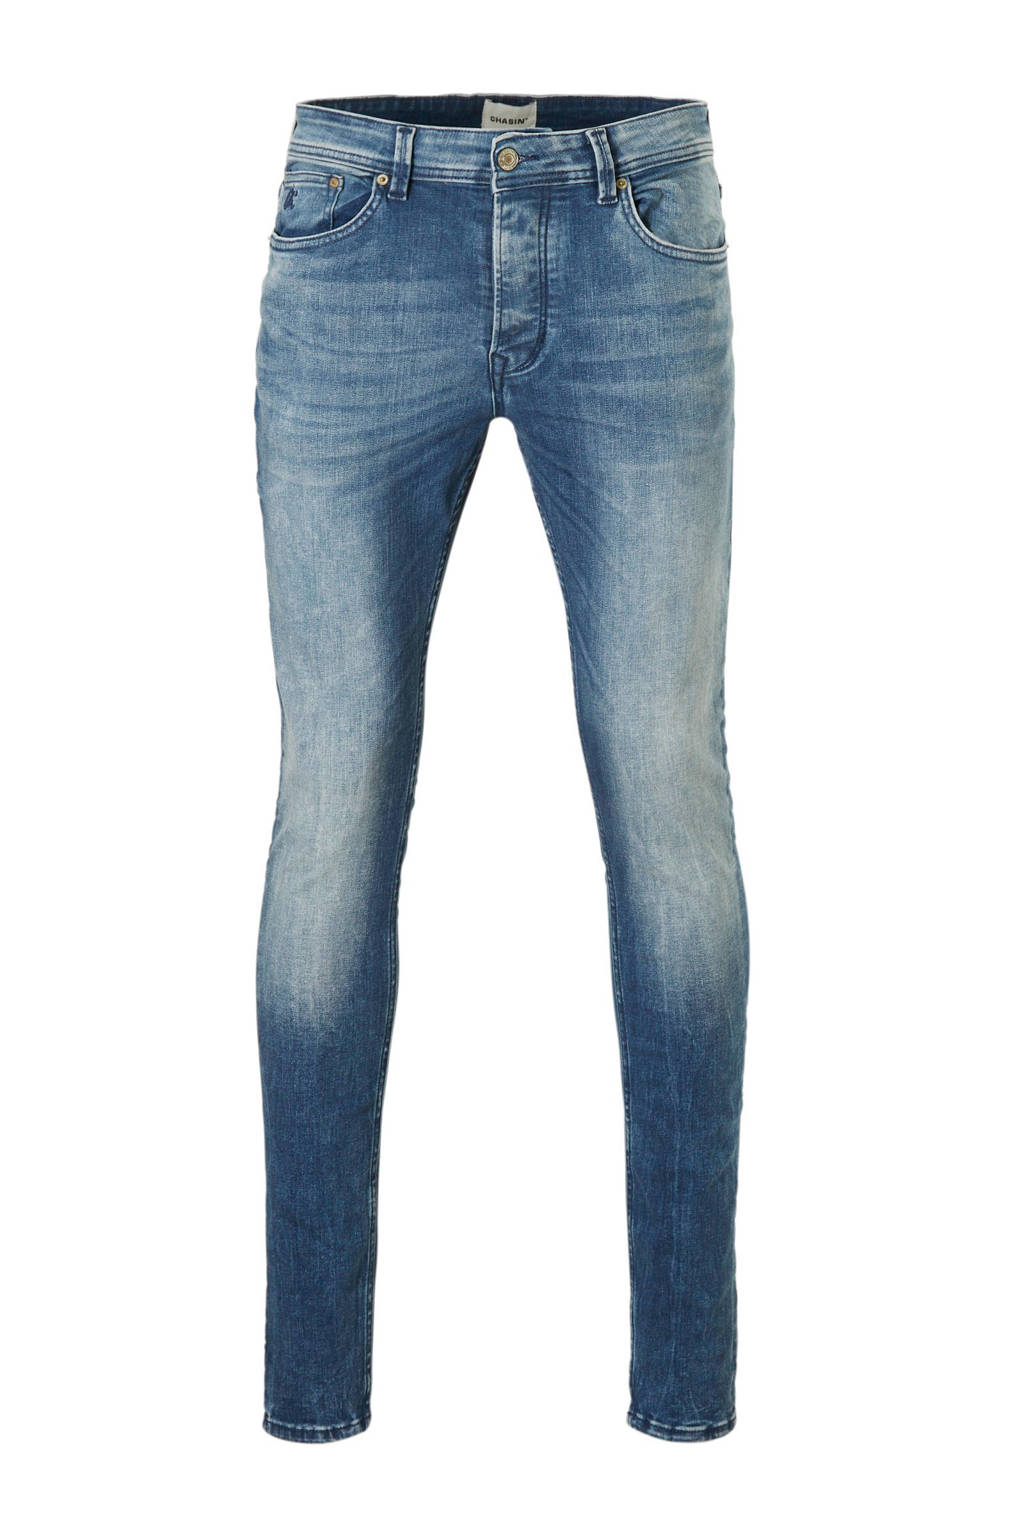 Chasin' slim fit jeans Ego, Blauw